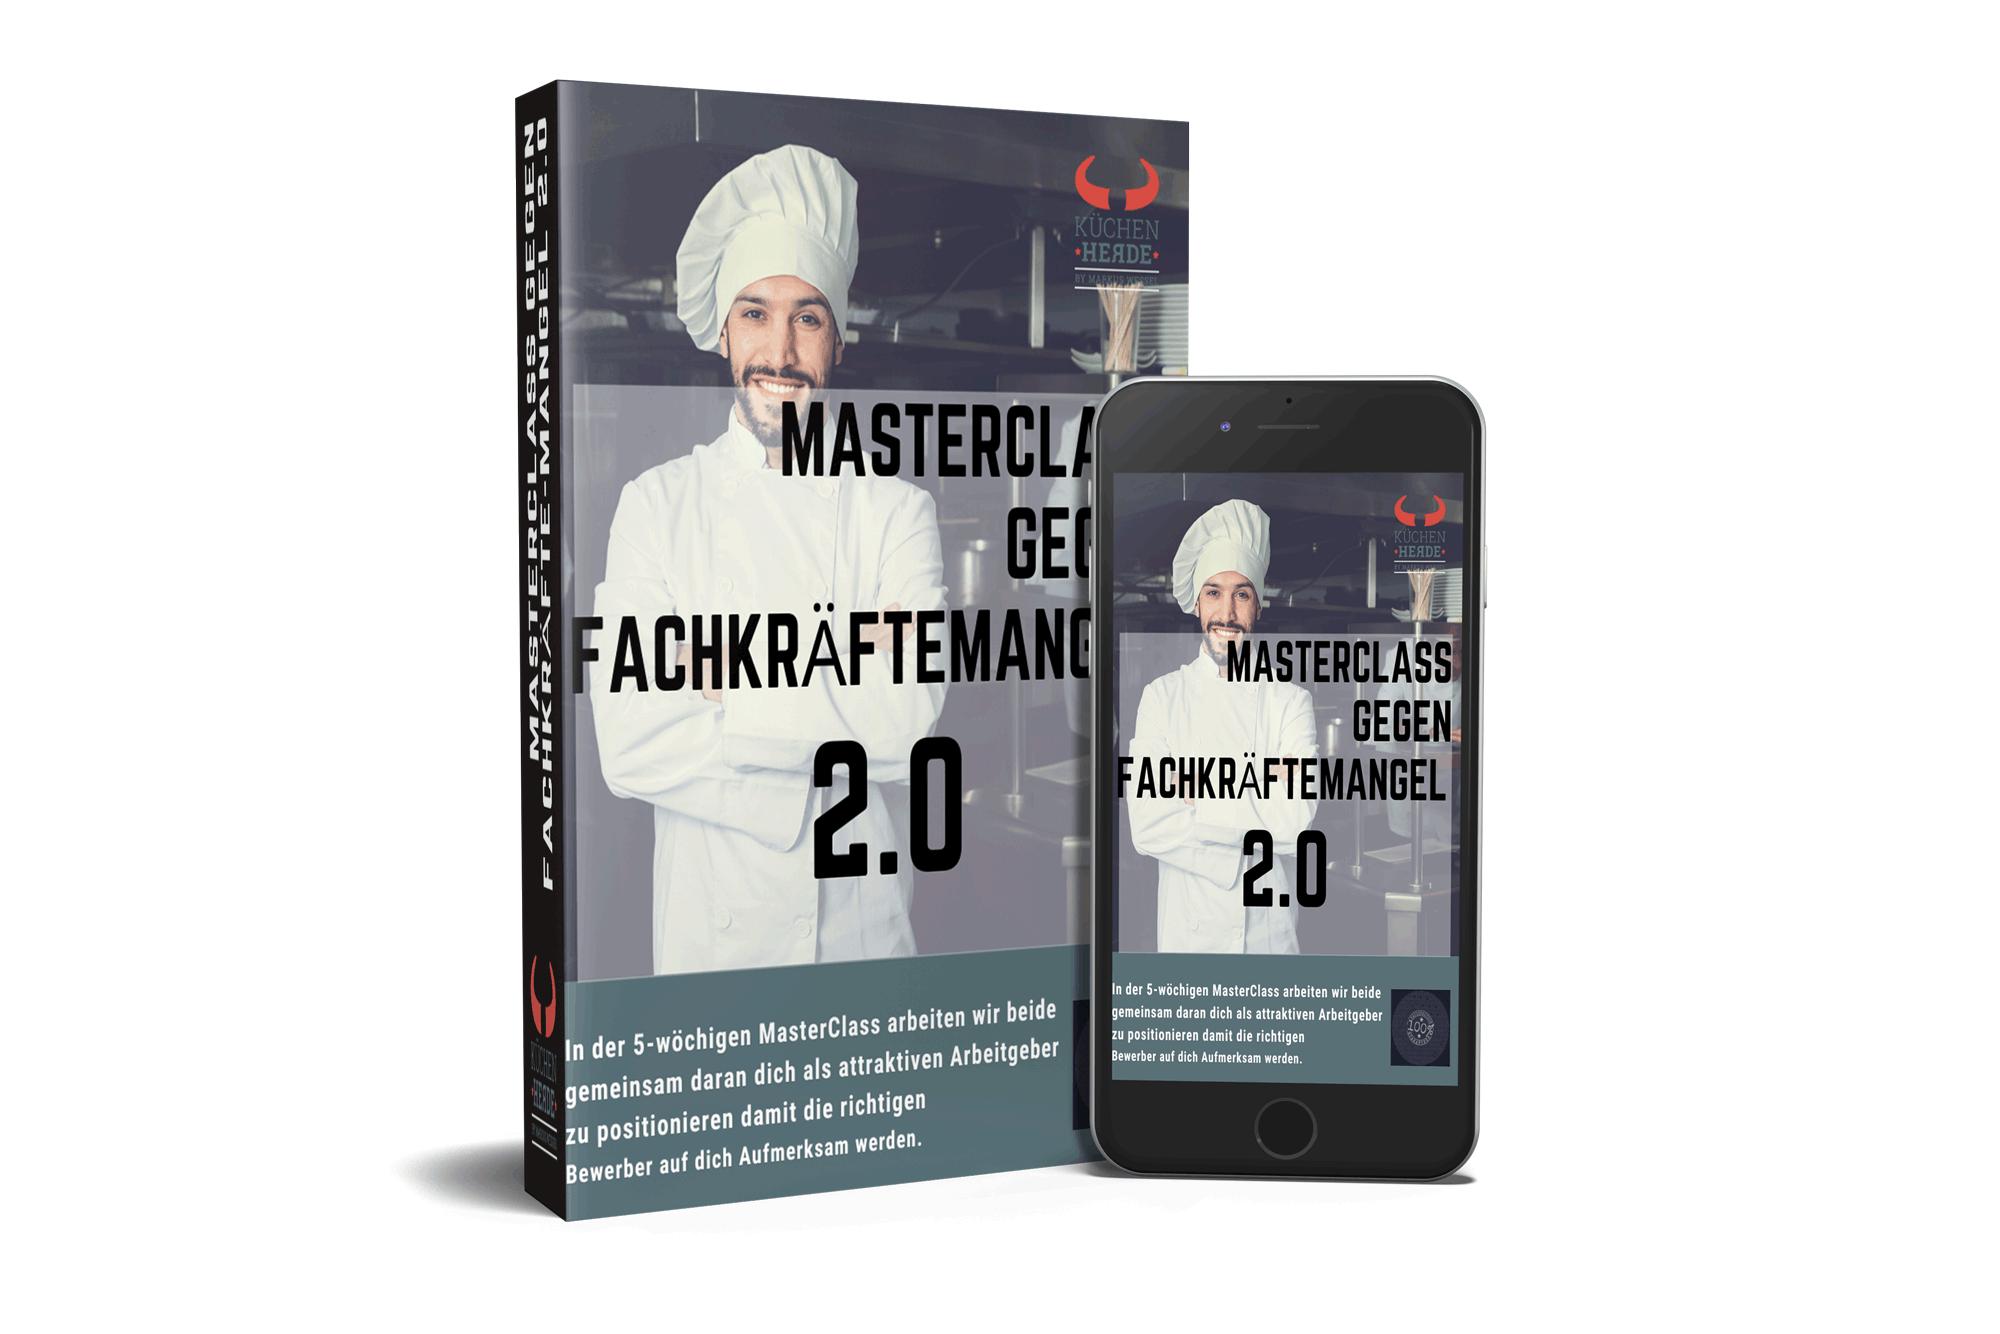 Masterclass-gegen-den-Fachkräftemangel-2